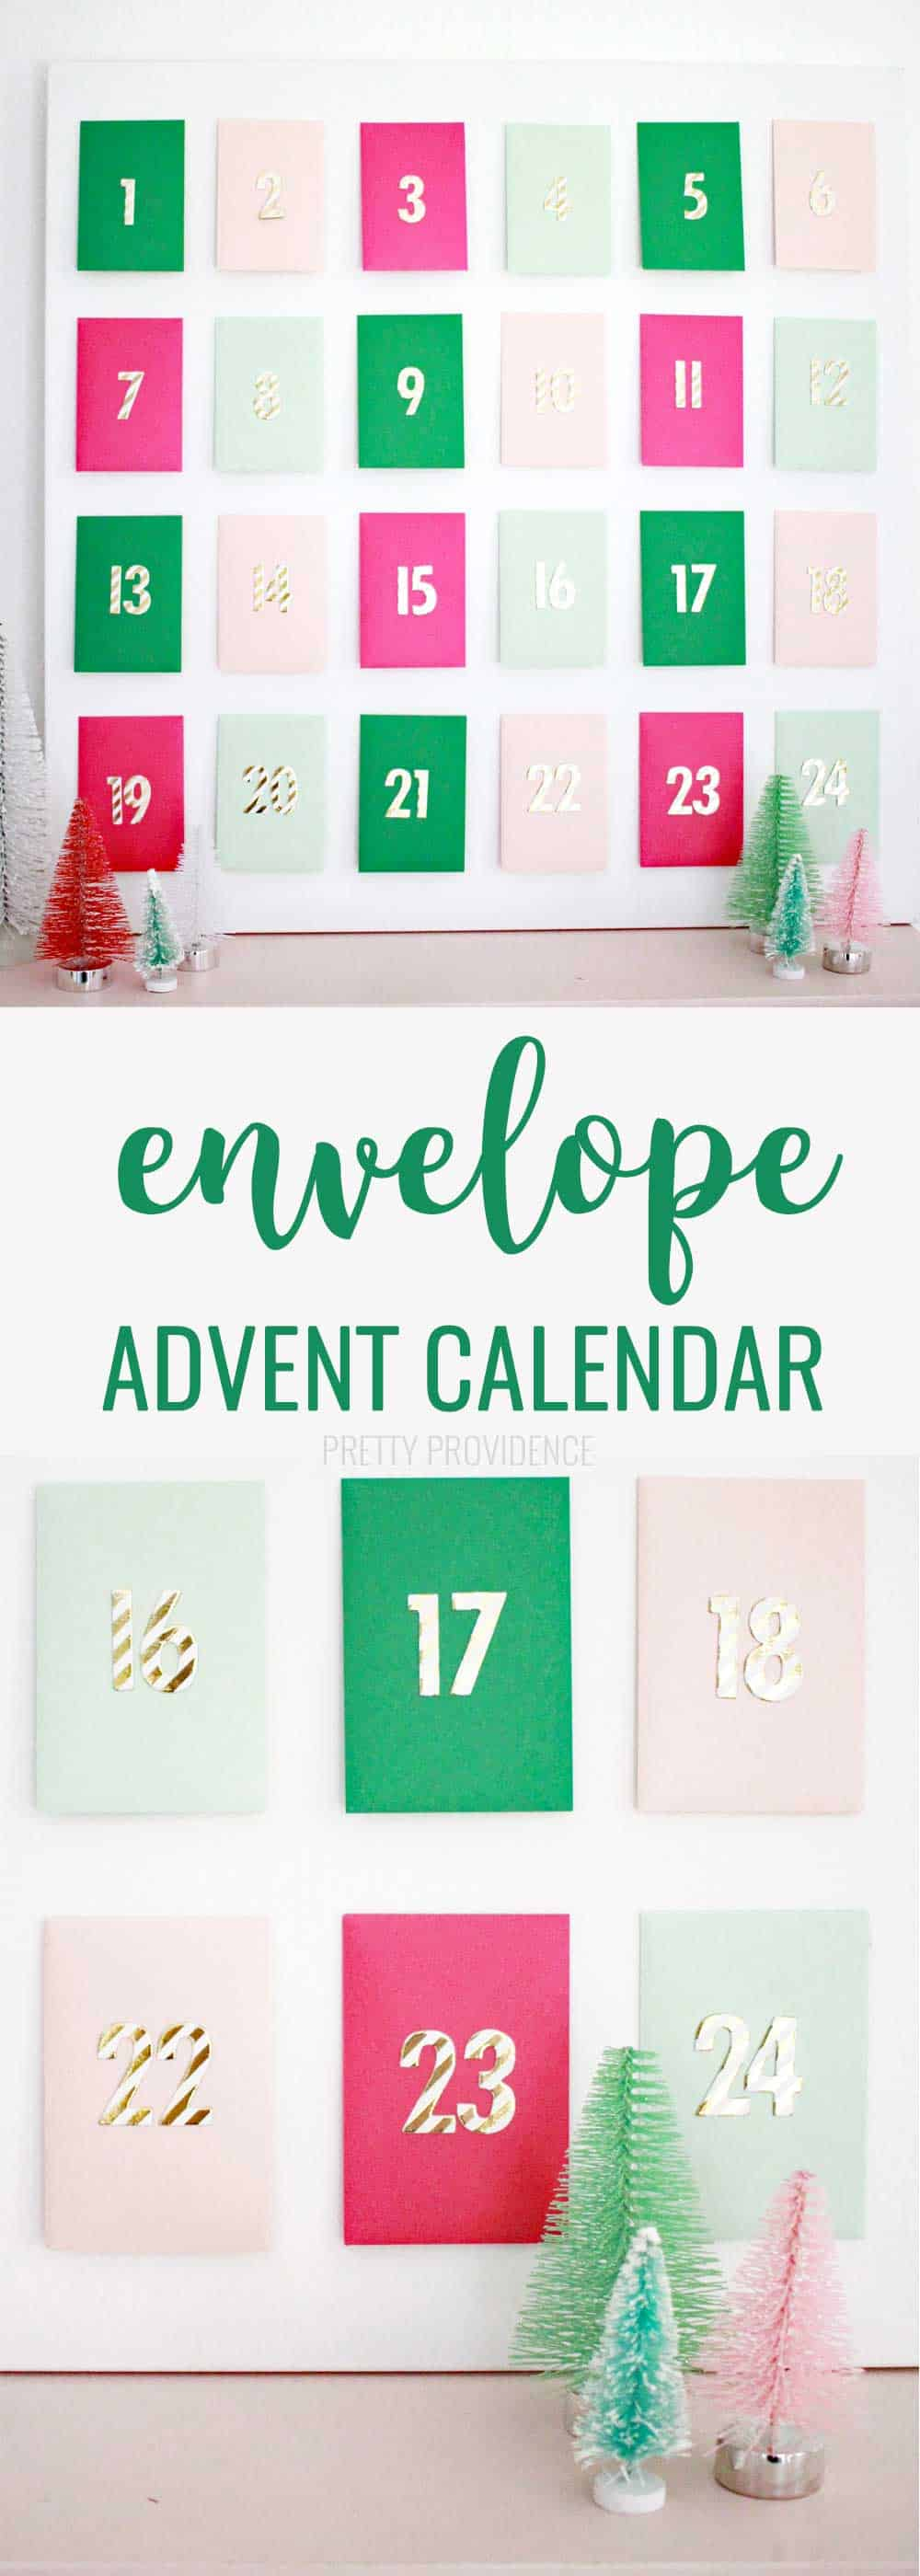 DIY Advent Calendar with Envelopes!